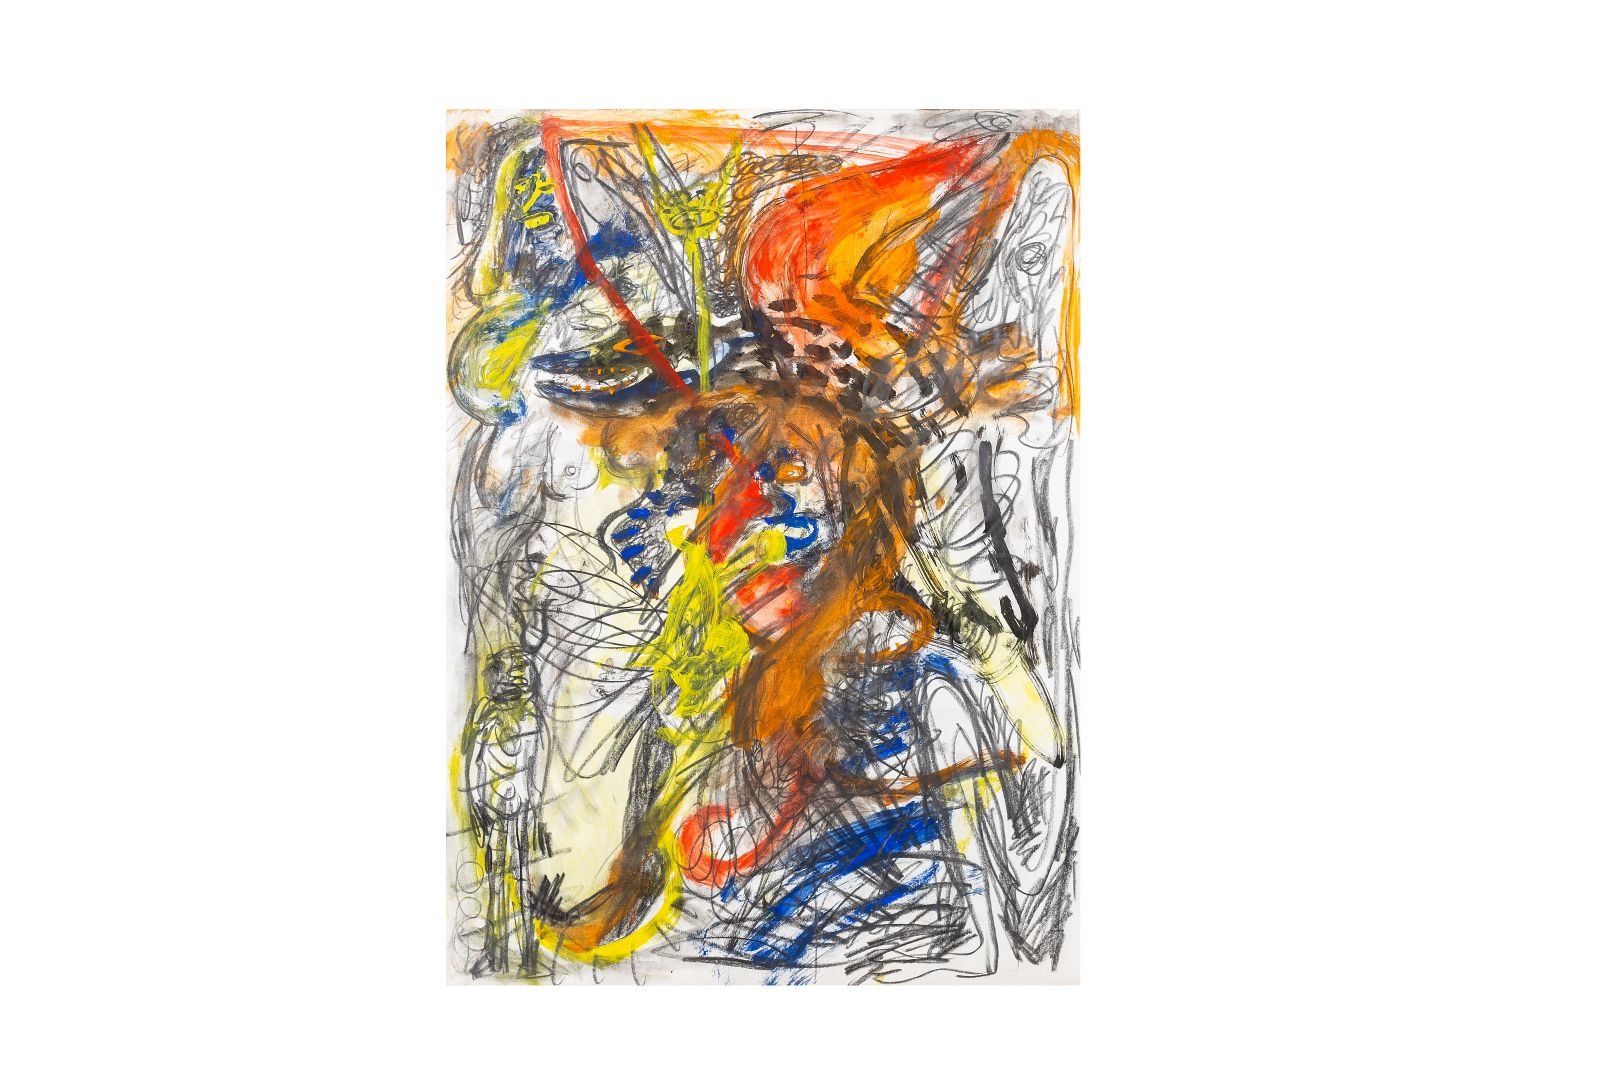 "#66 Franz Hitzler, ""Abstract Composition"", 1980, mixed media, * | Franz Hitzler, ""Abstrakte Komposition"", 1980, Mischtechnik,* Image"